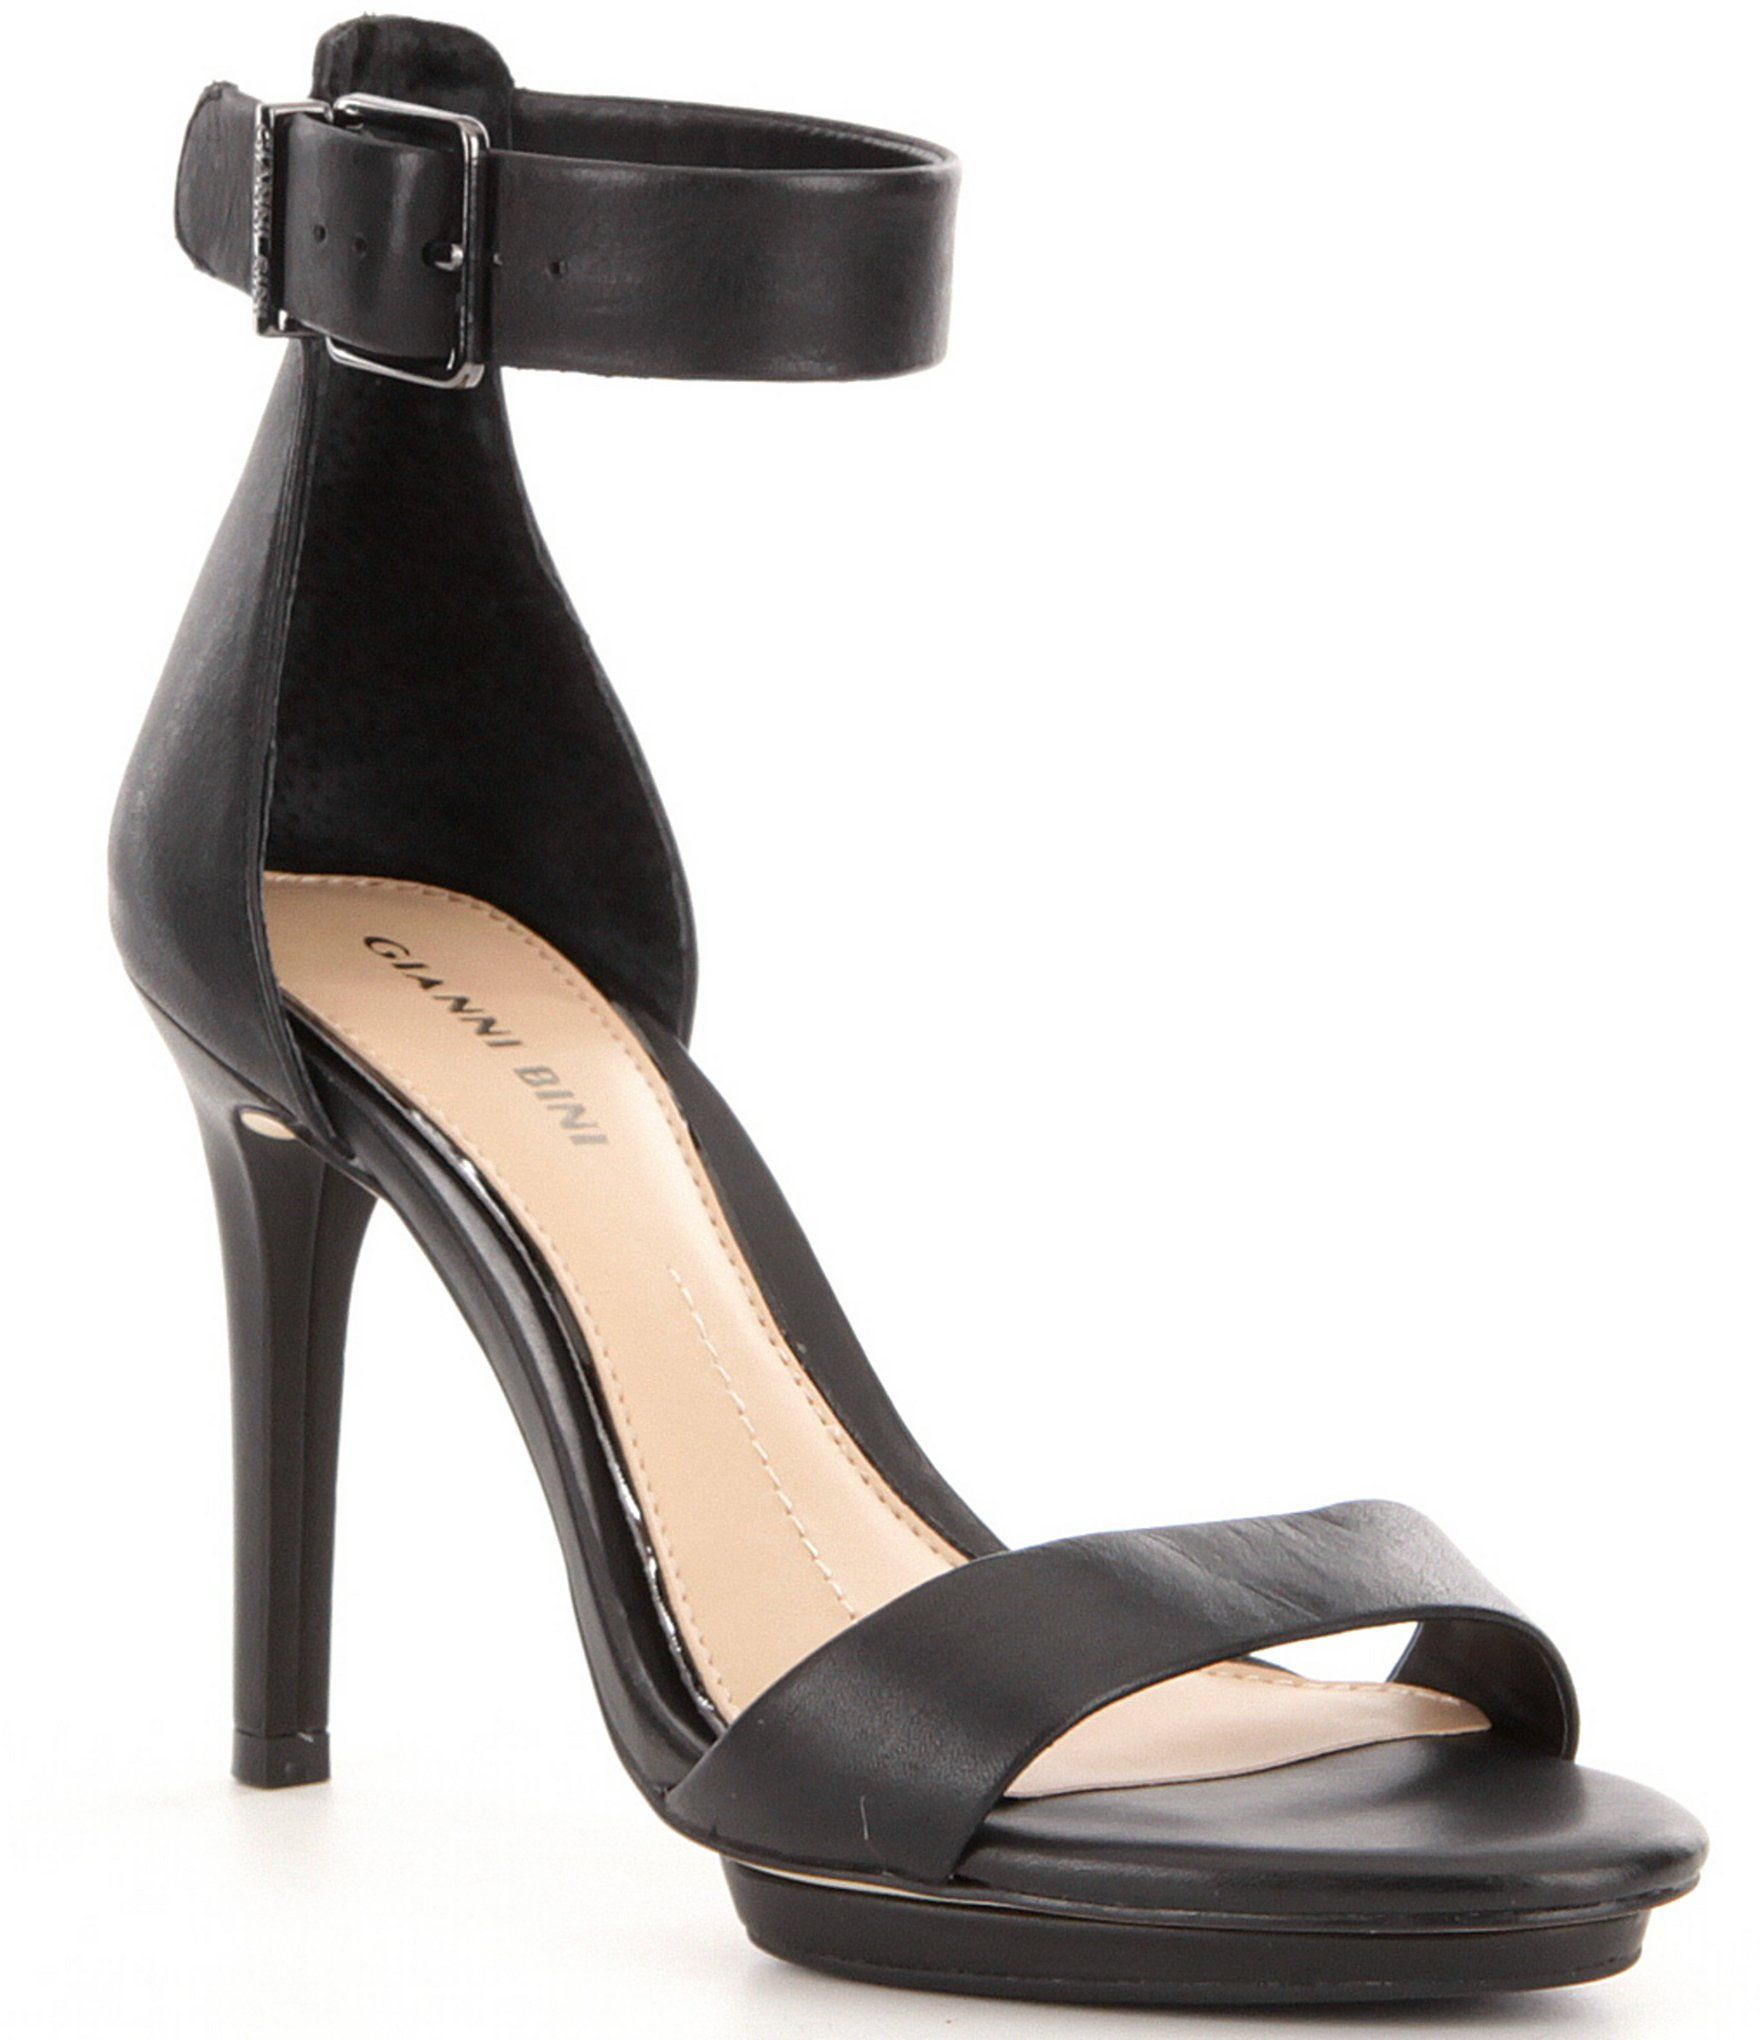 Lizette Leather Ankle Strap Dress Sandals cuh7CjkX7